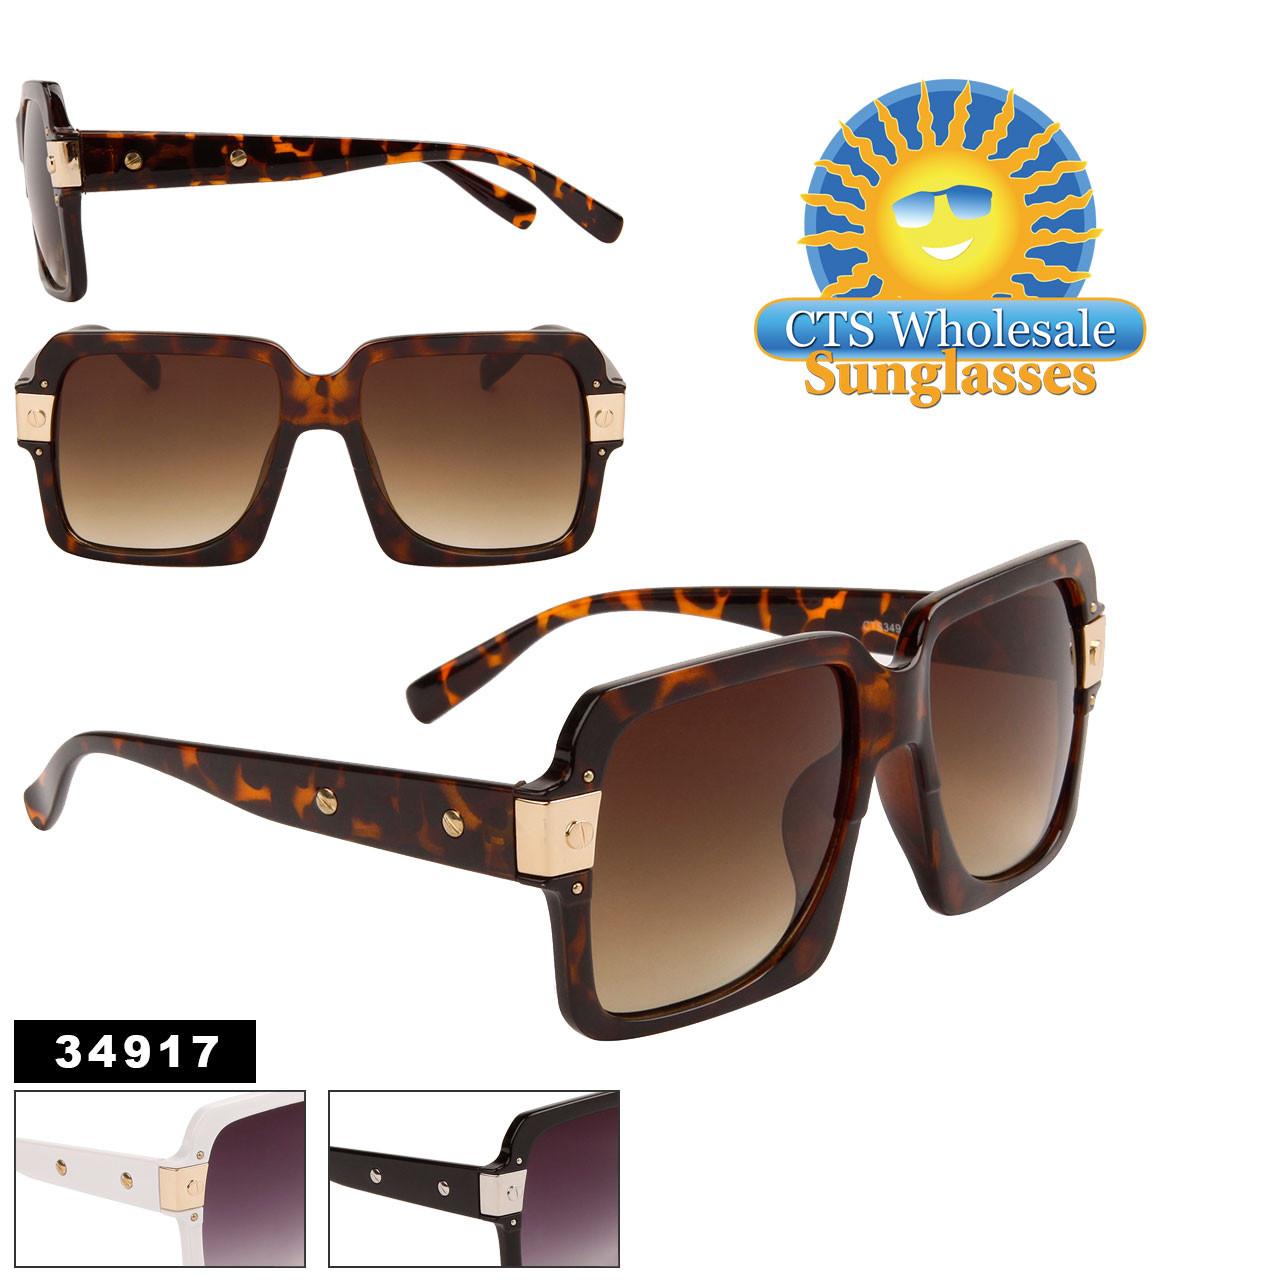 Fashion Sunglasses in Bulk - Style #34917 (Assorted Colors) (12 pcs.)